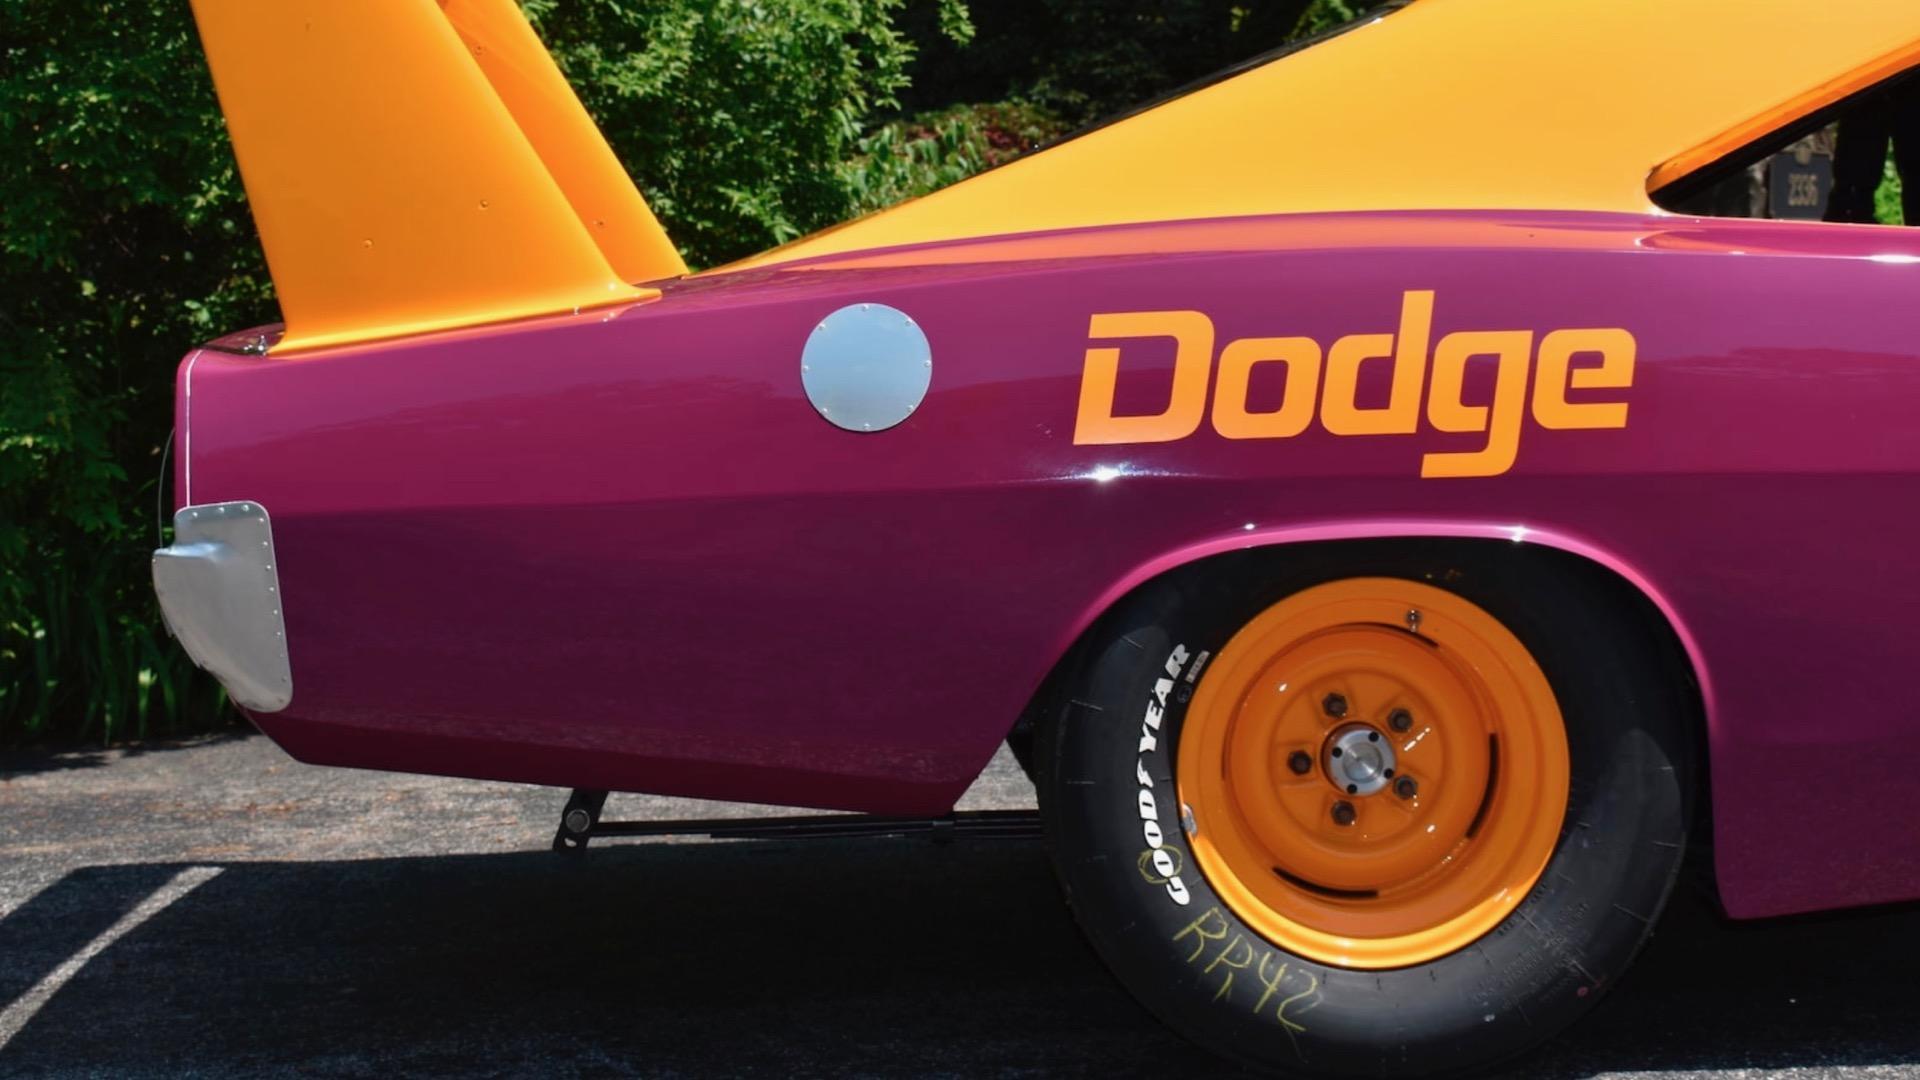 1969 dodge charger daytona nascar photo by mecum auctions 100794729 h